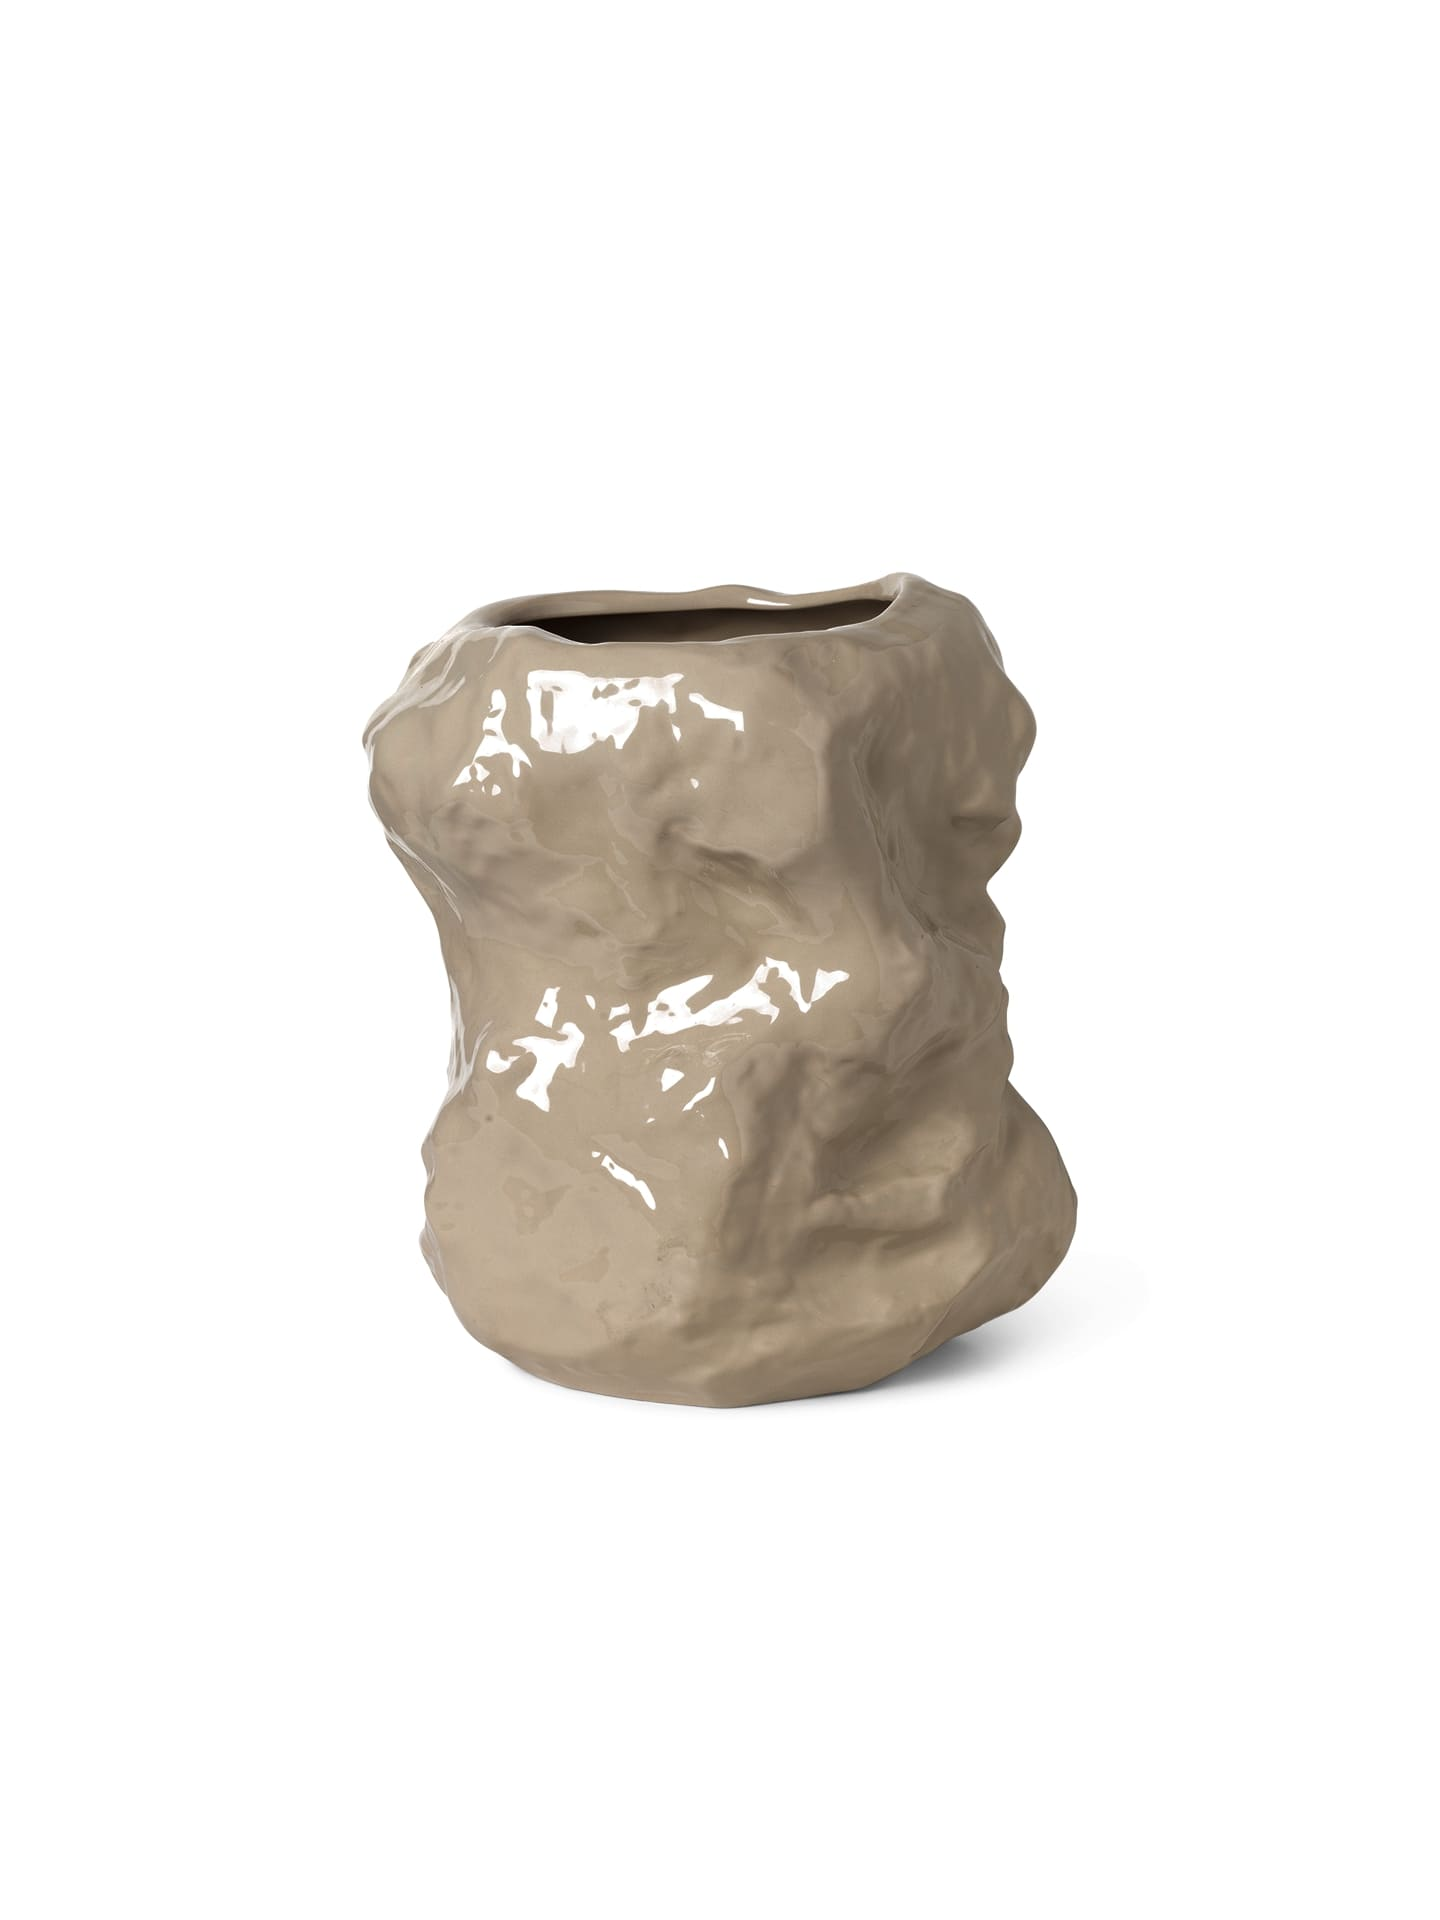 ferm LIVING Tuck vase, cashmere